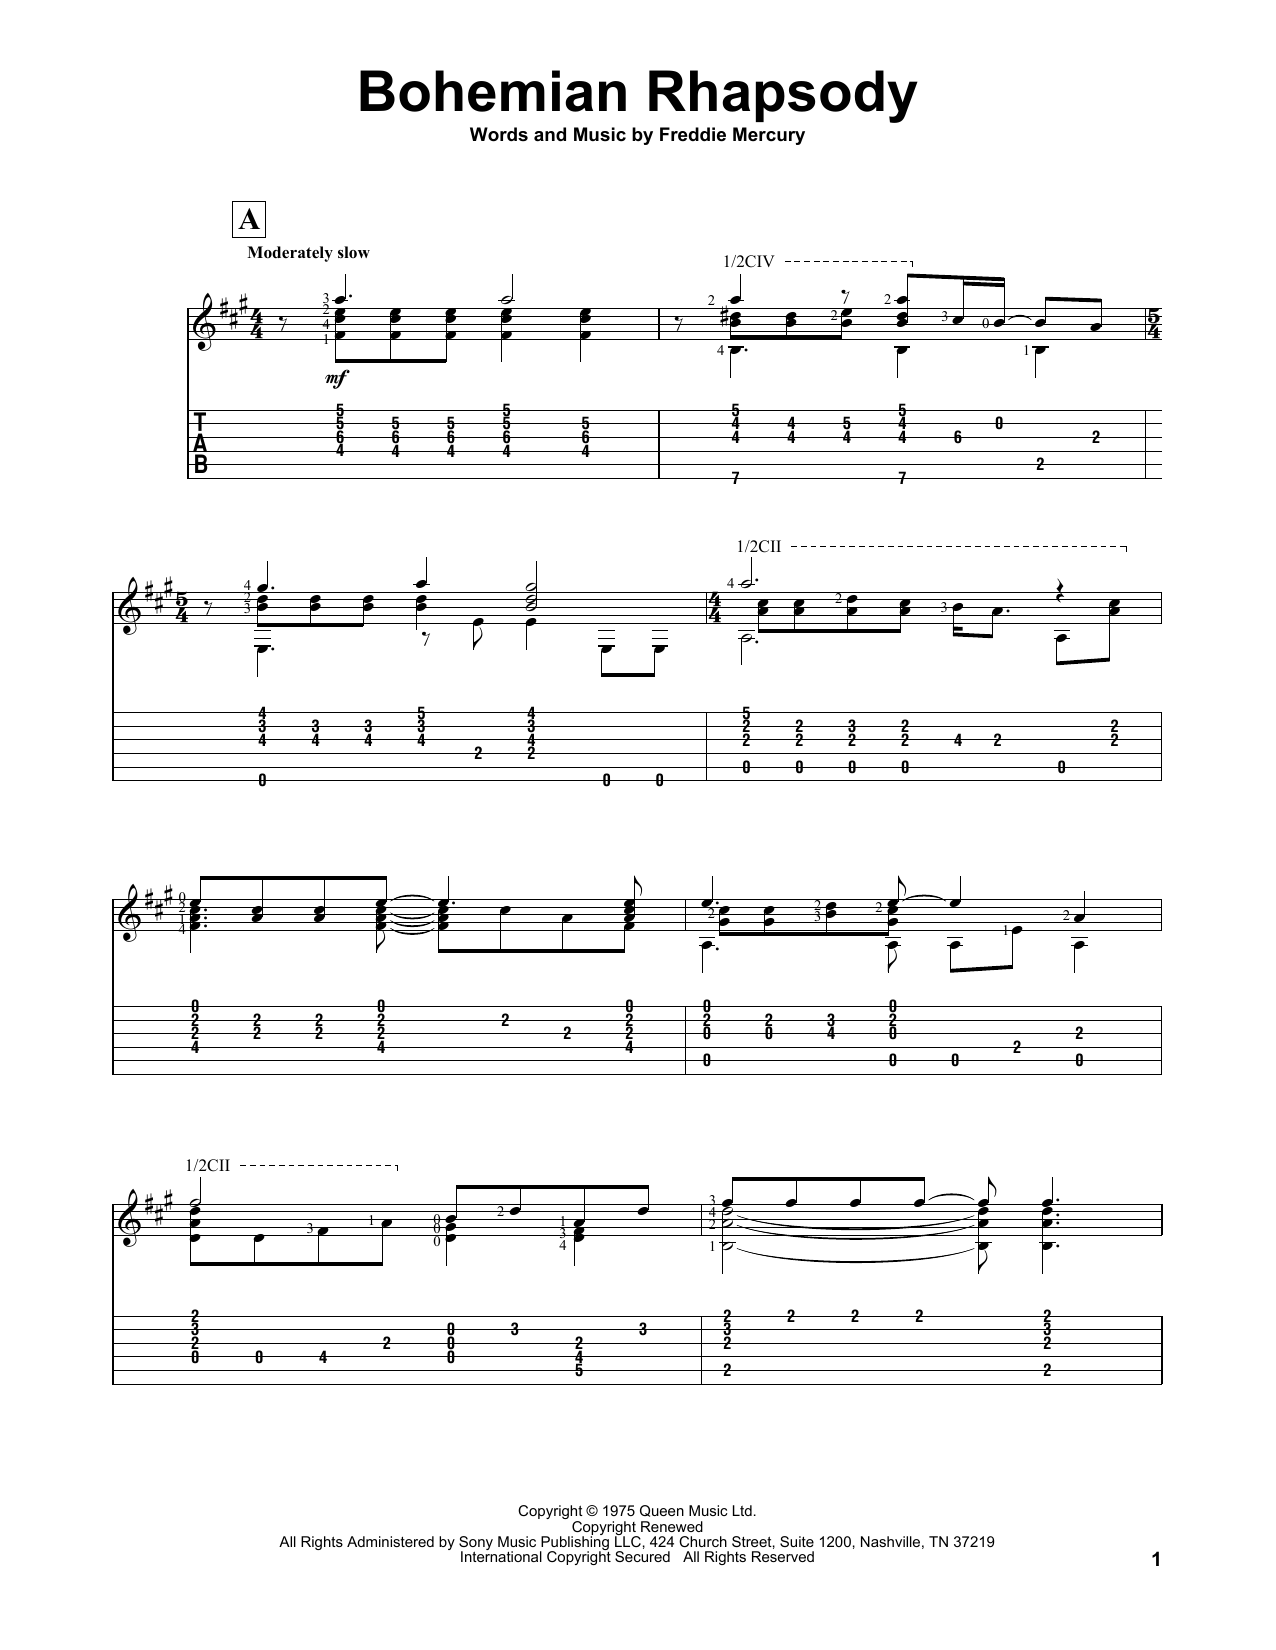 Sheet Music Digital Files To Print - Licensed Queen Digital Sheet Music